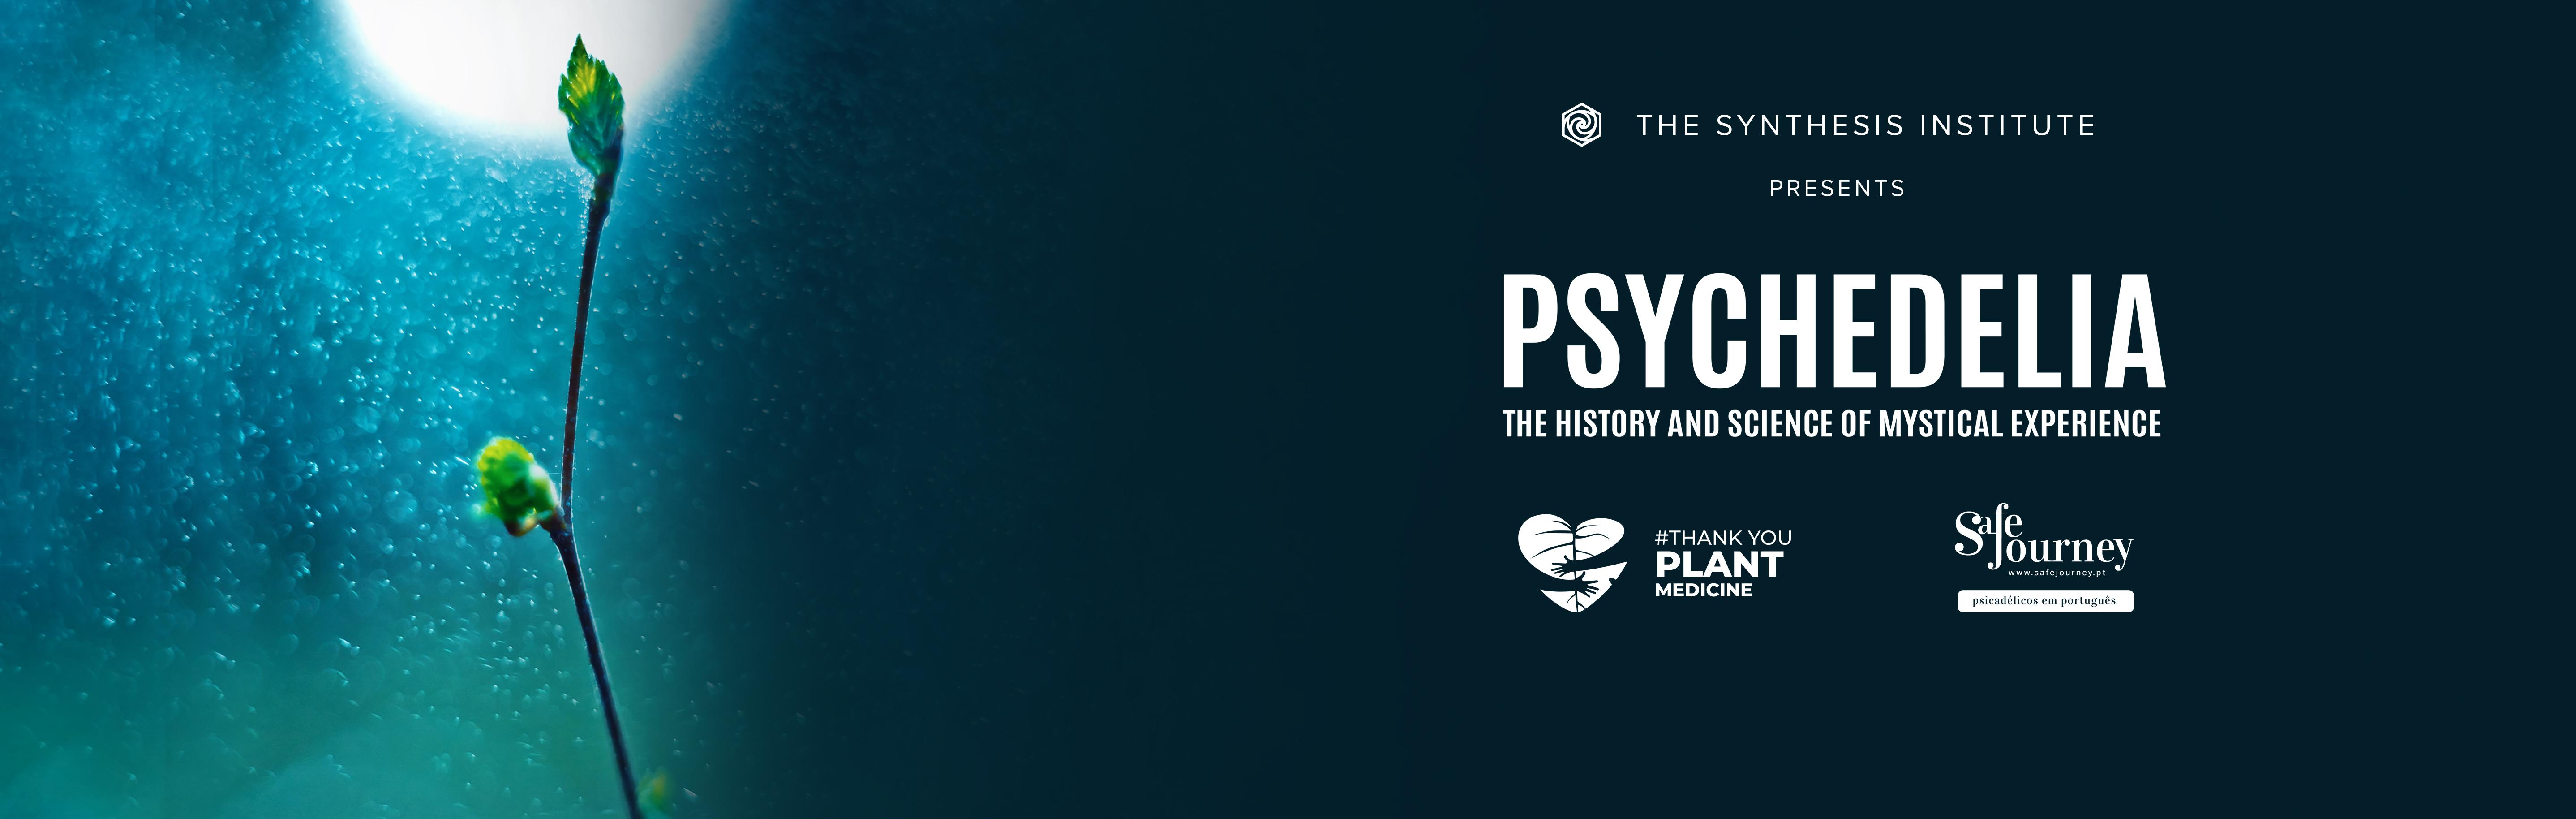 Psychedelia-banner